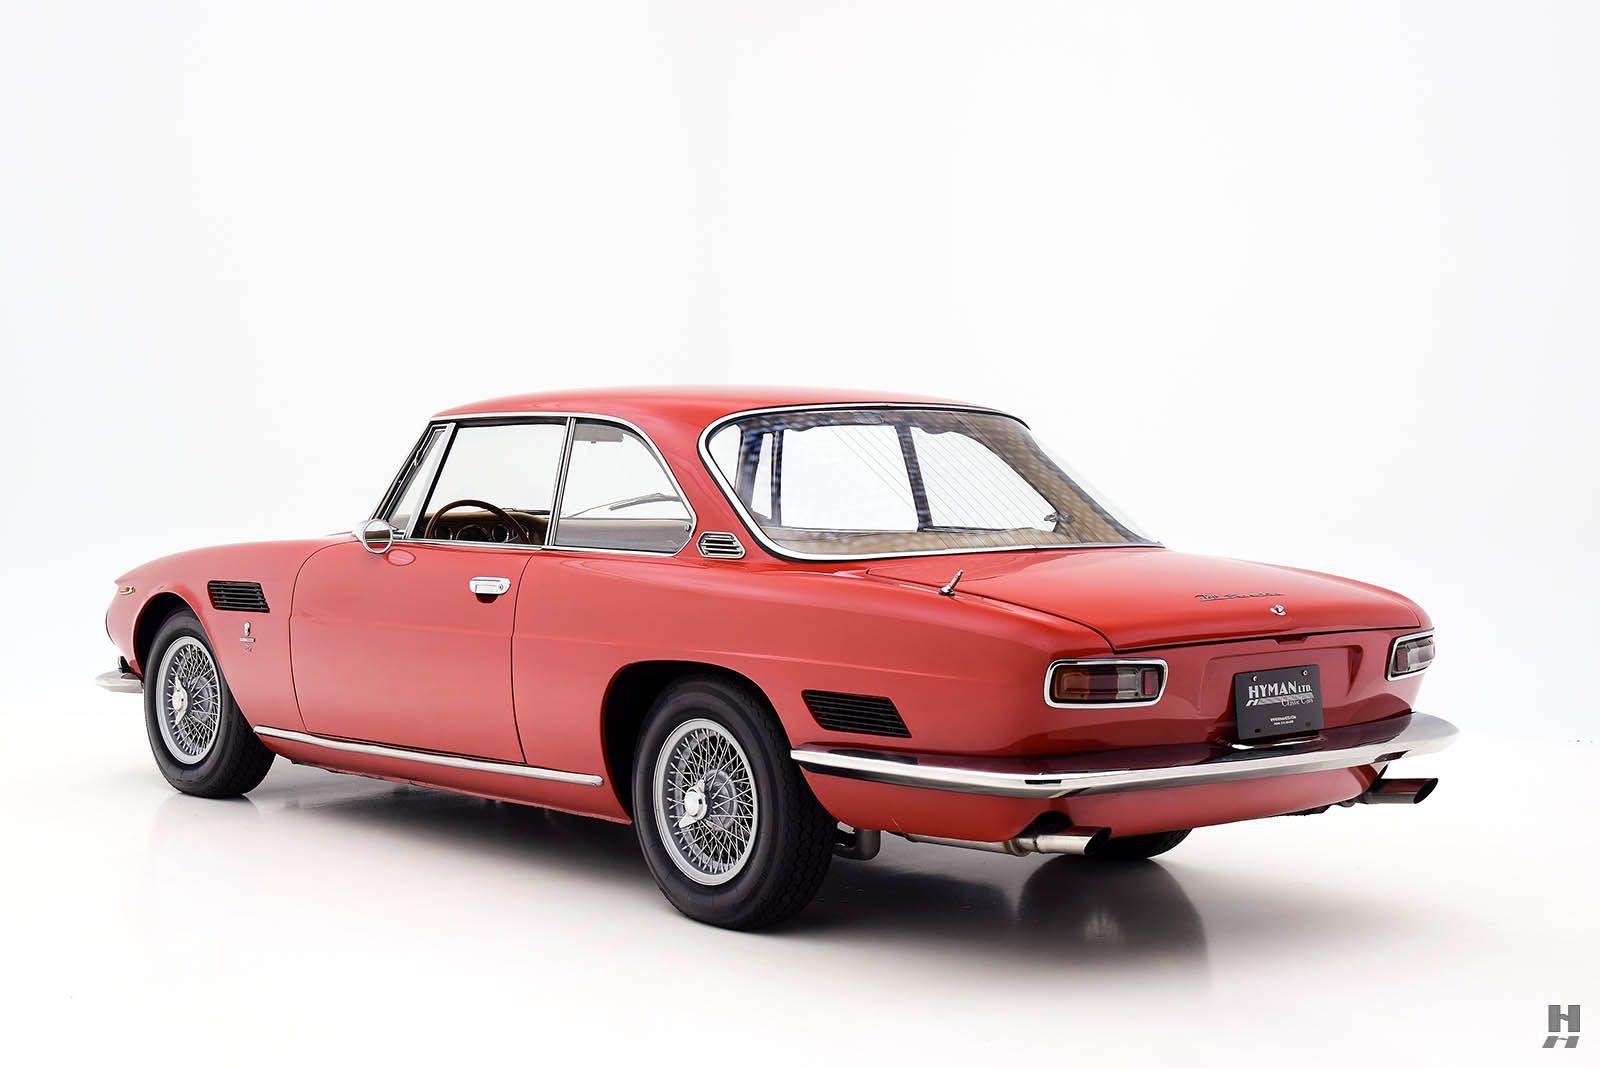 1969 iso rivolta ir 340 coupe 4 roues, Roue